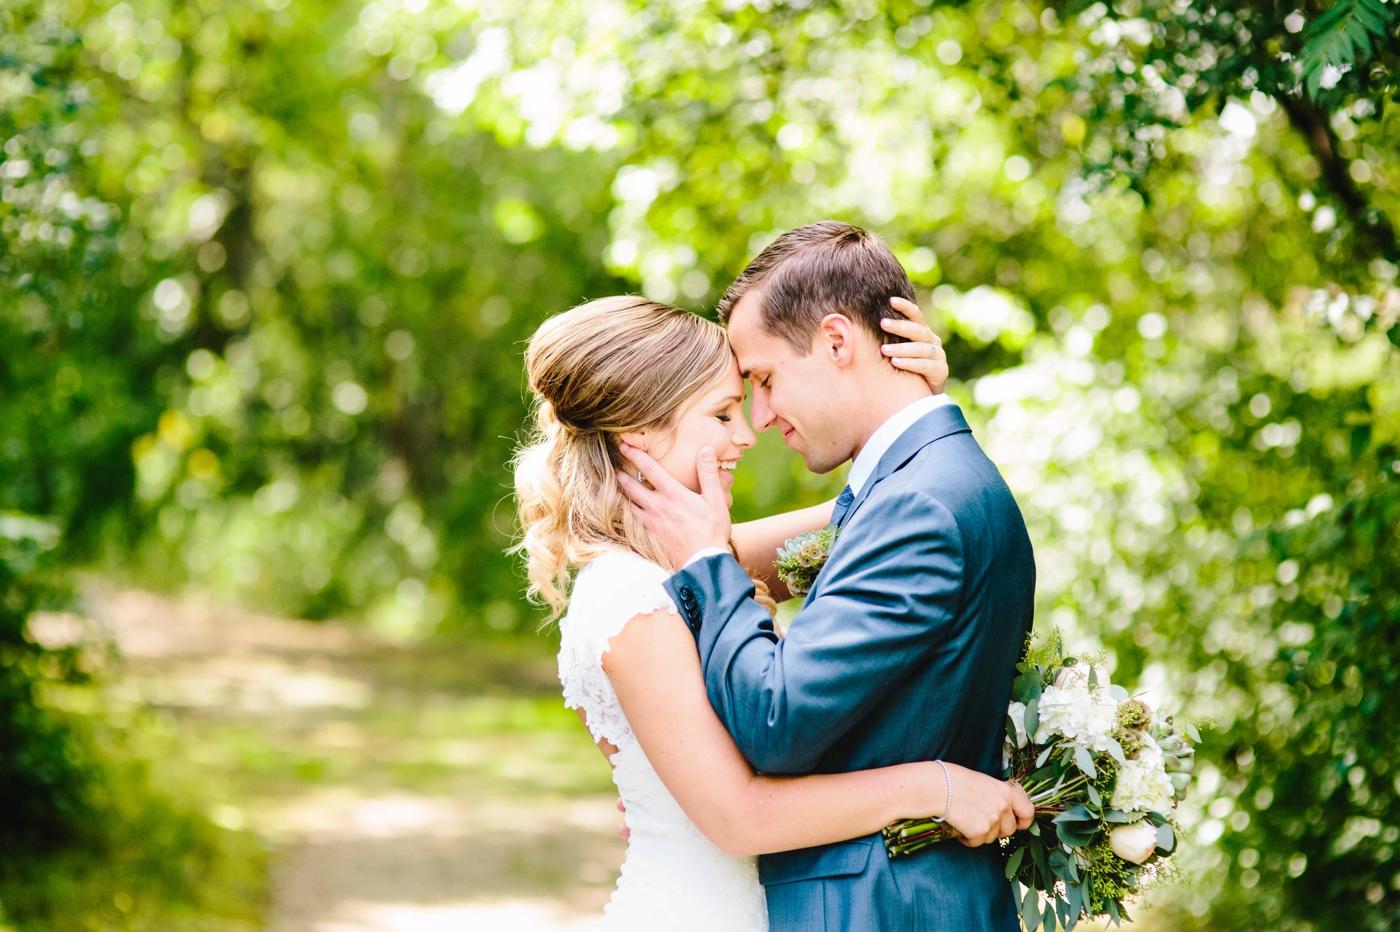 chicago-fine-art-wedding-photography-chiapetta35